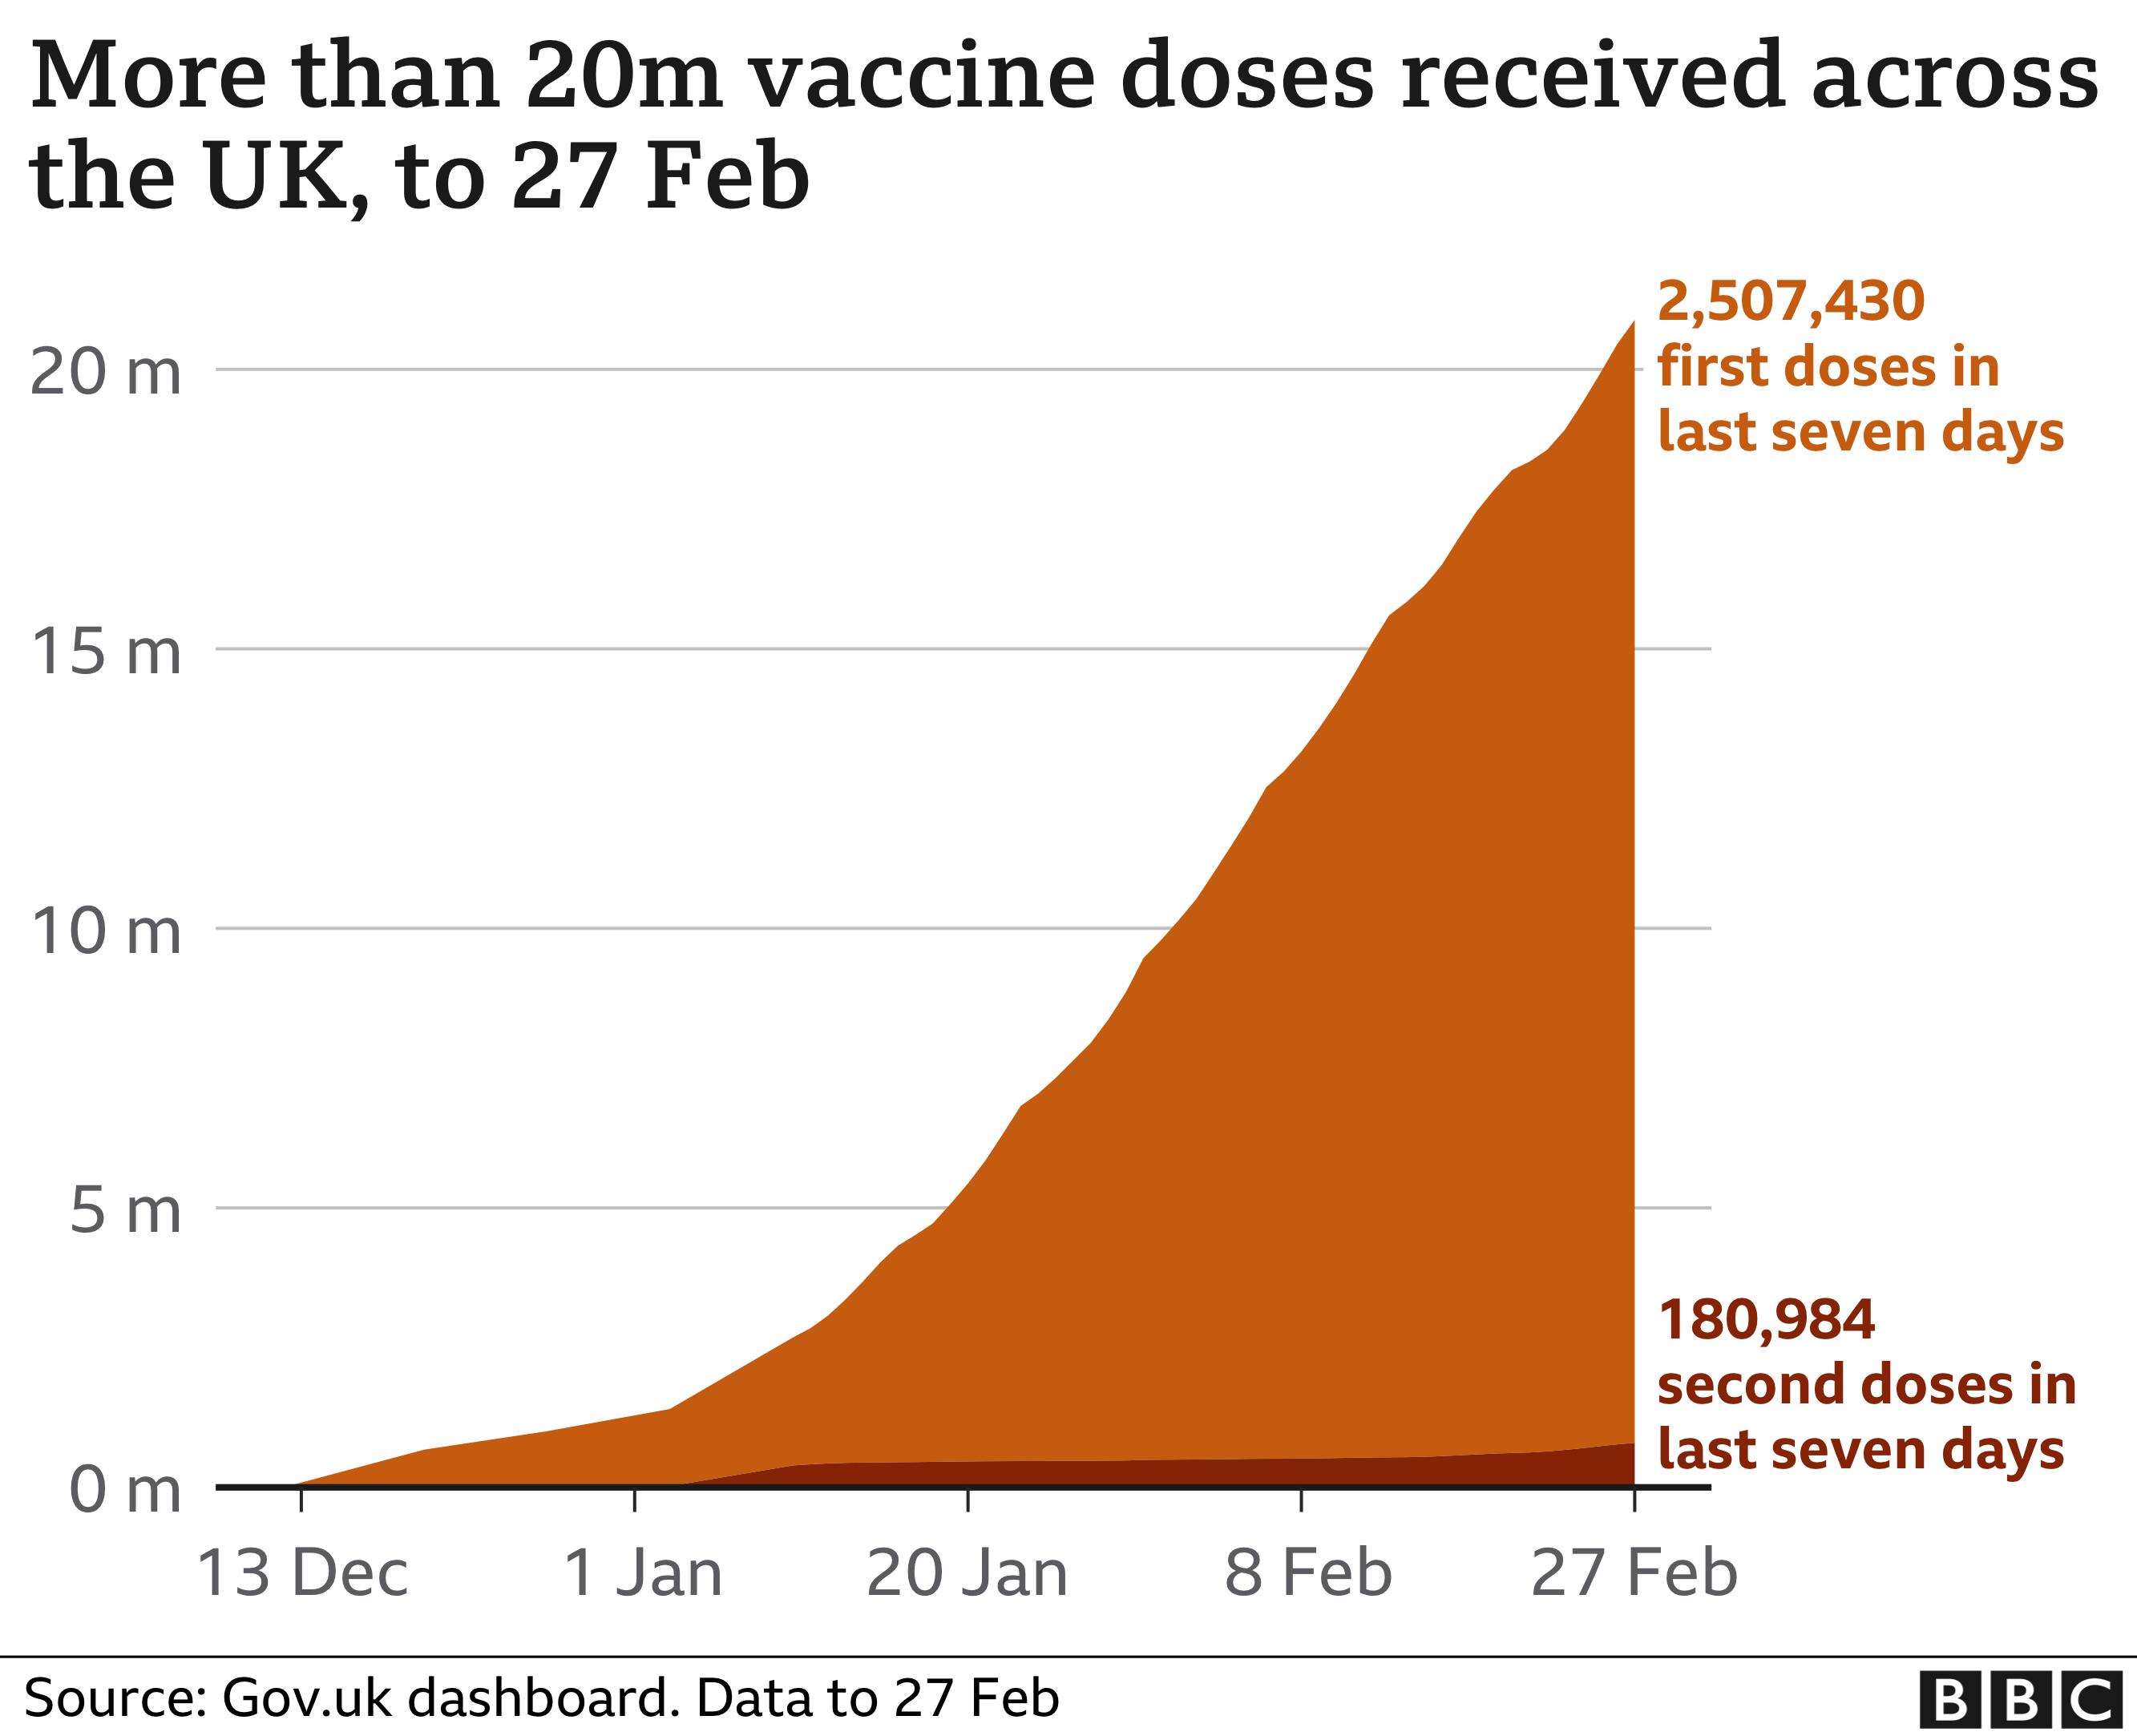 Vaccination trajectory graph